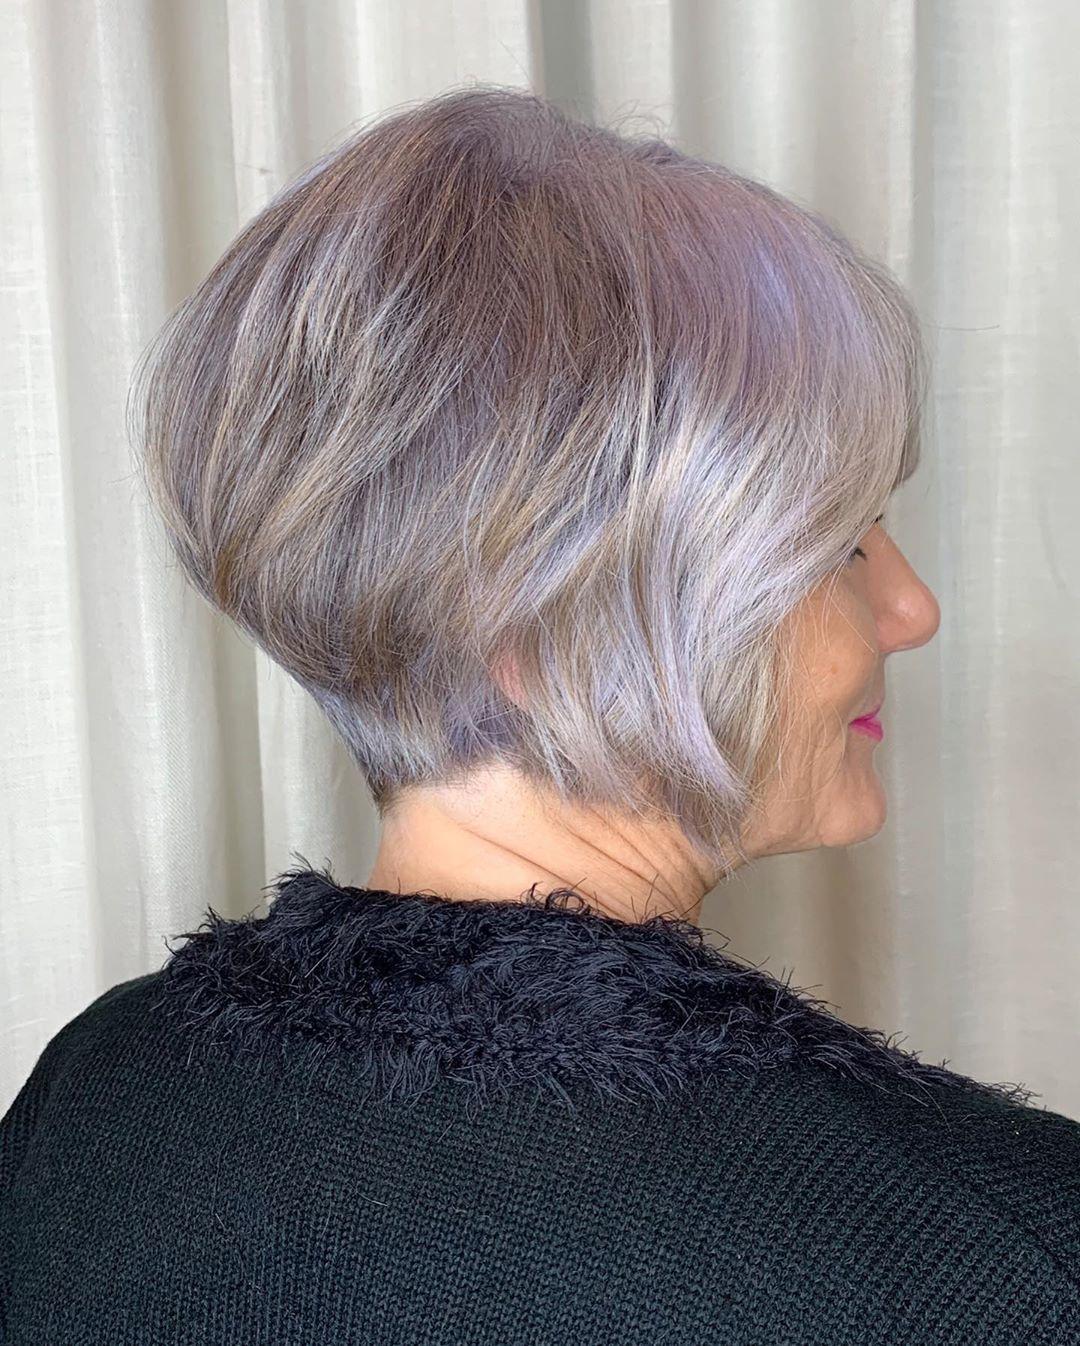 24 Classy Bob Haircuts for Older Women